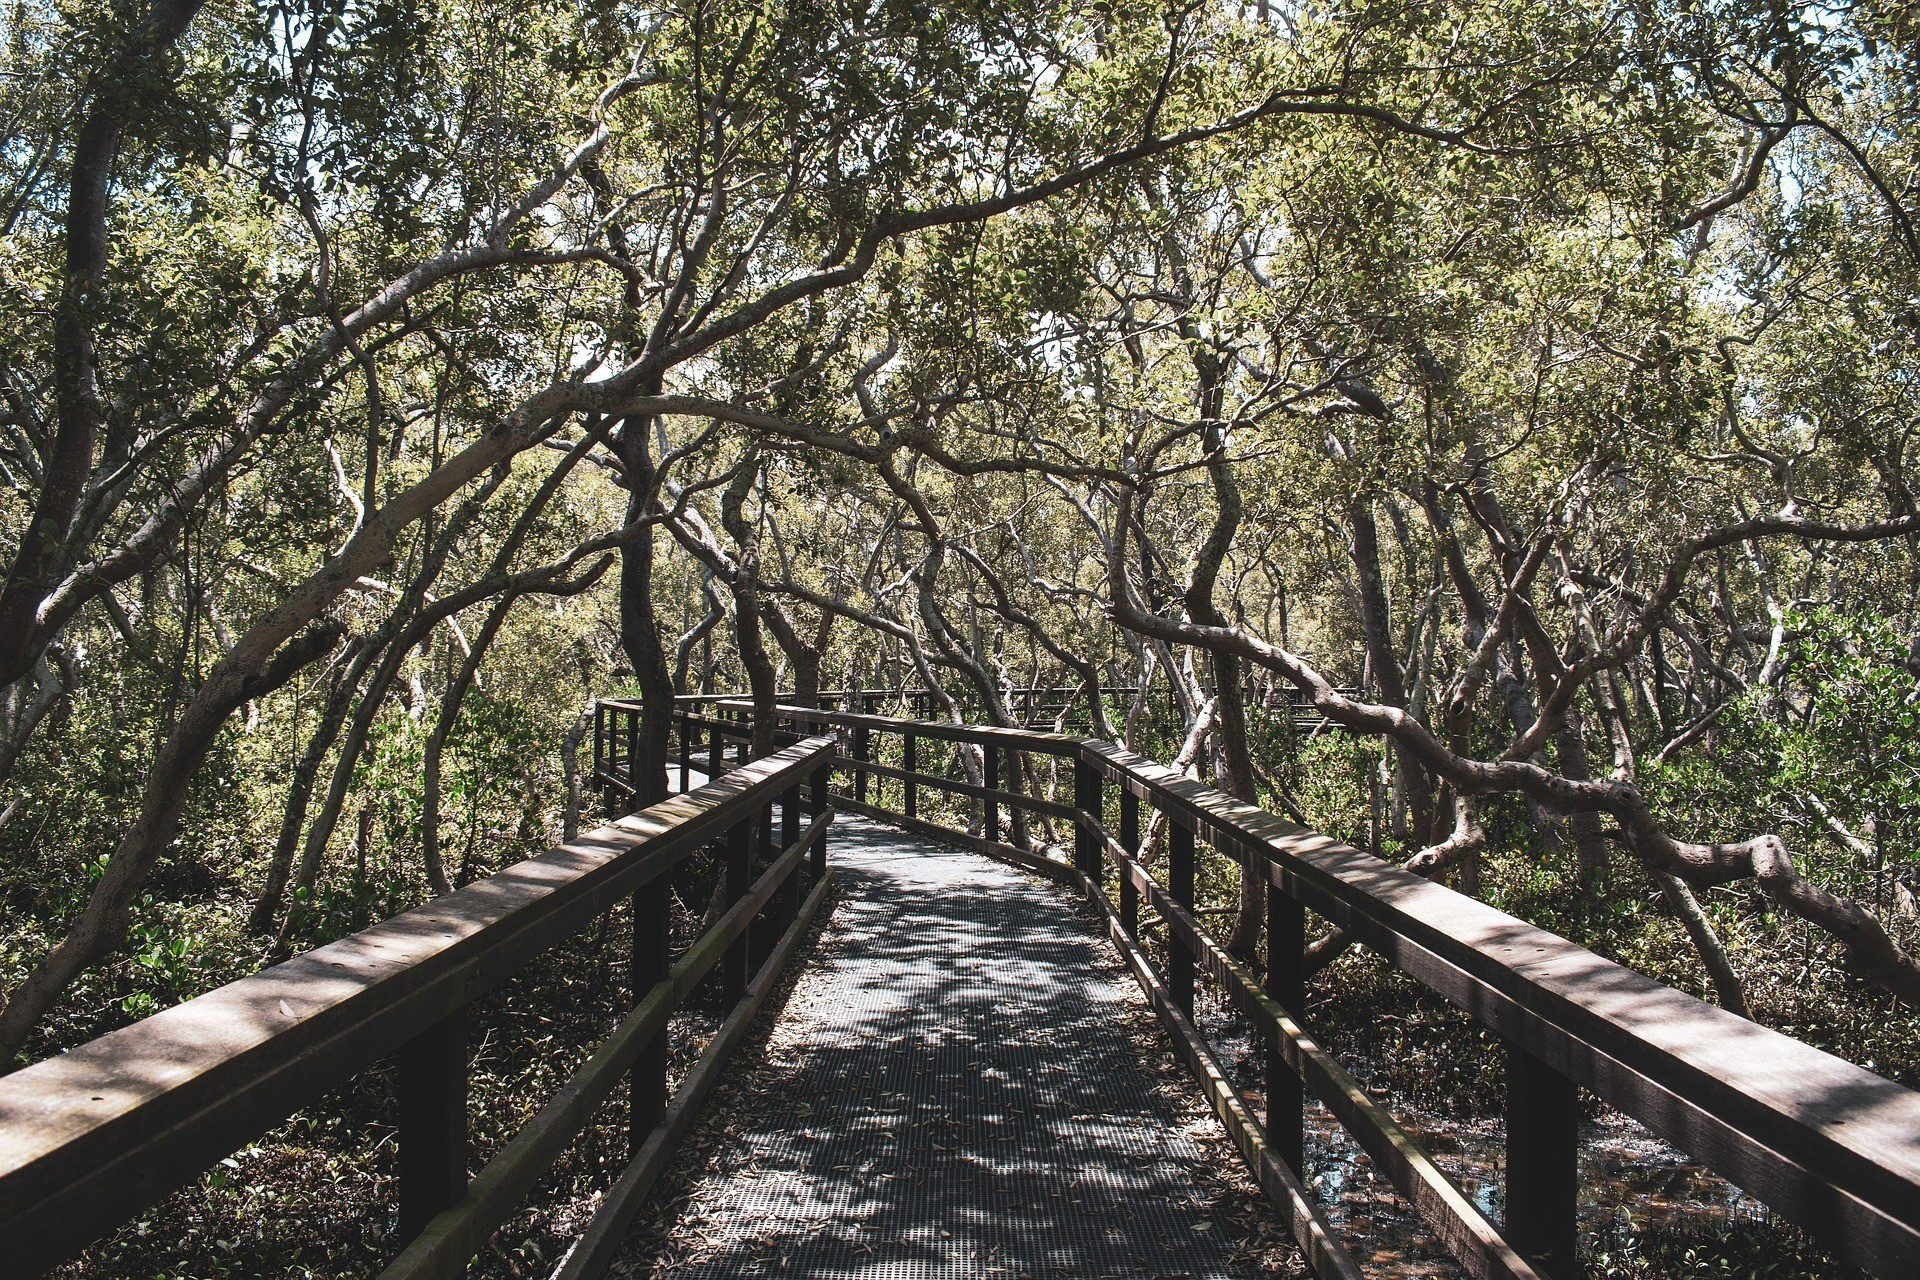 A walkway through a mangrove forest